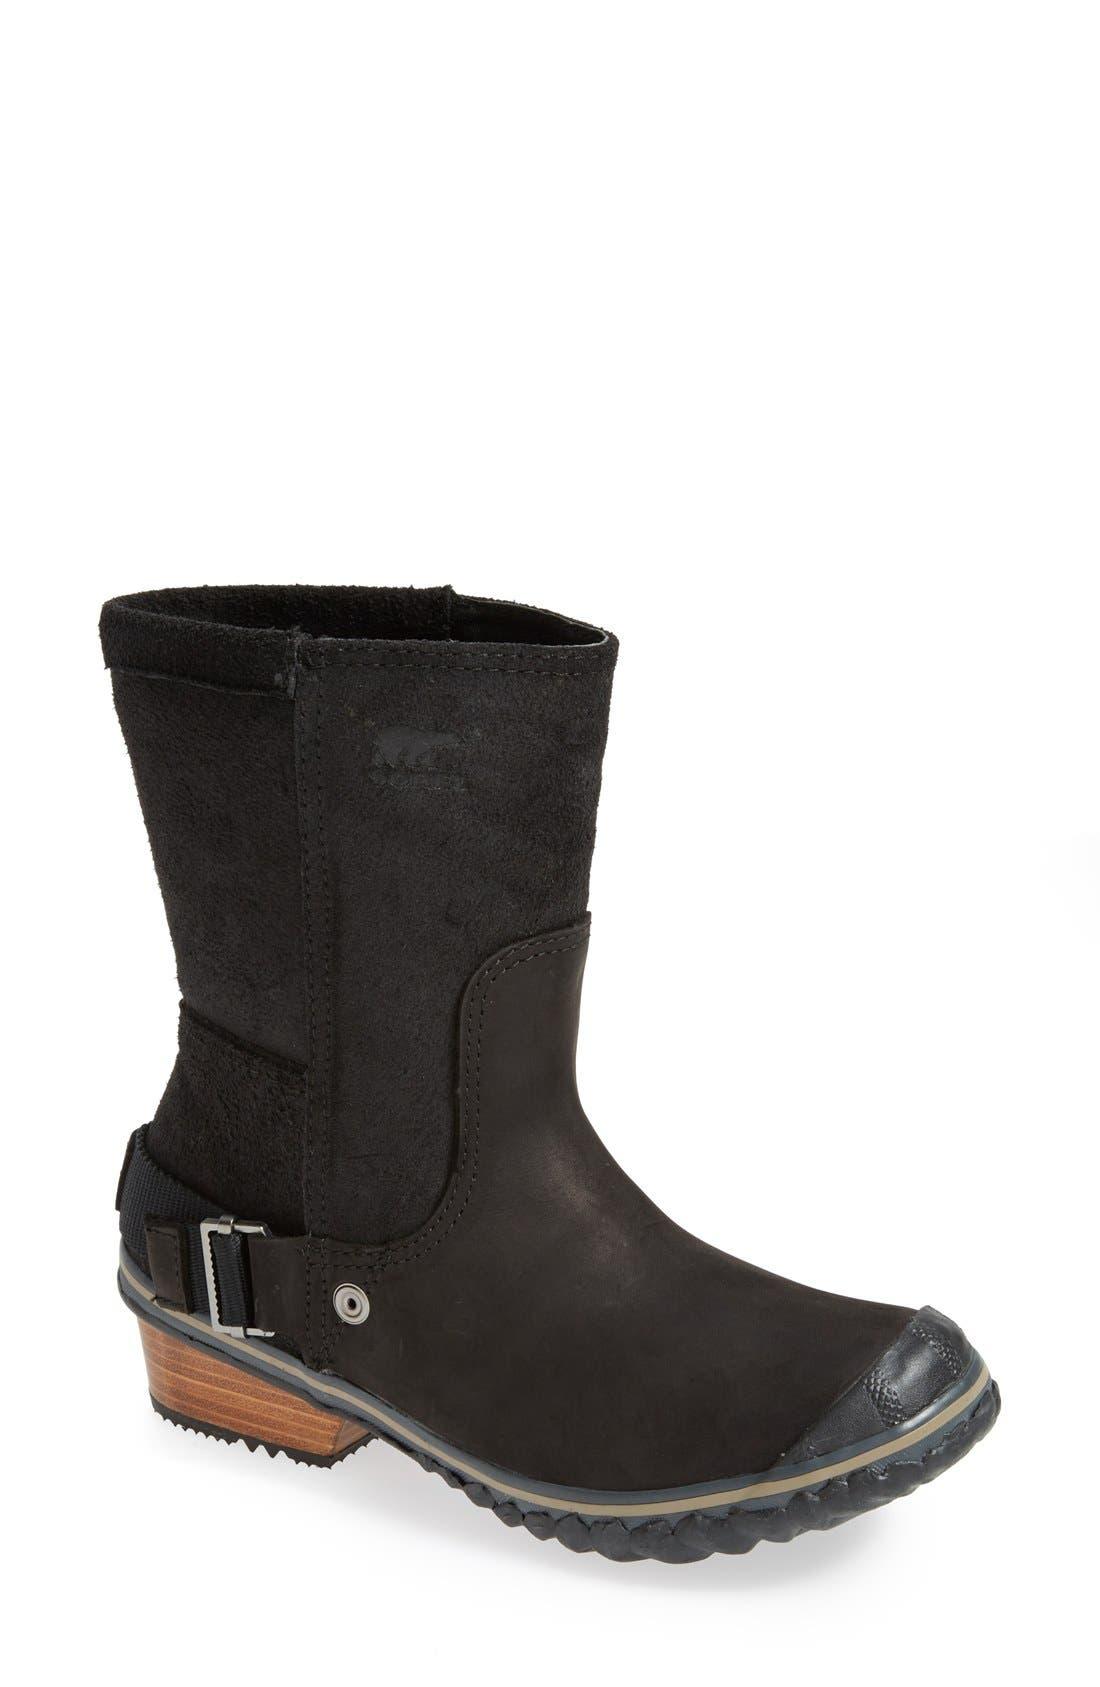 Main Image - SOREL 'Slimshortie™' Waterproof Boot (Women)